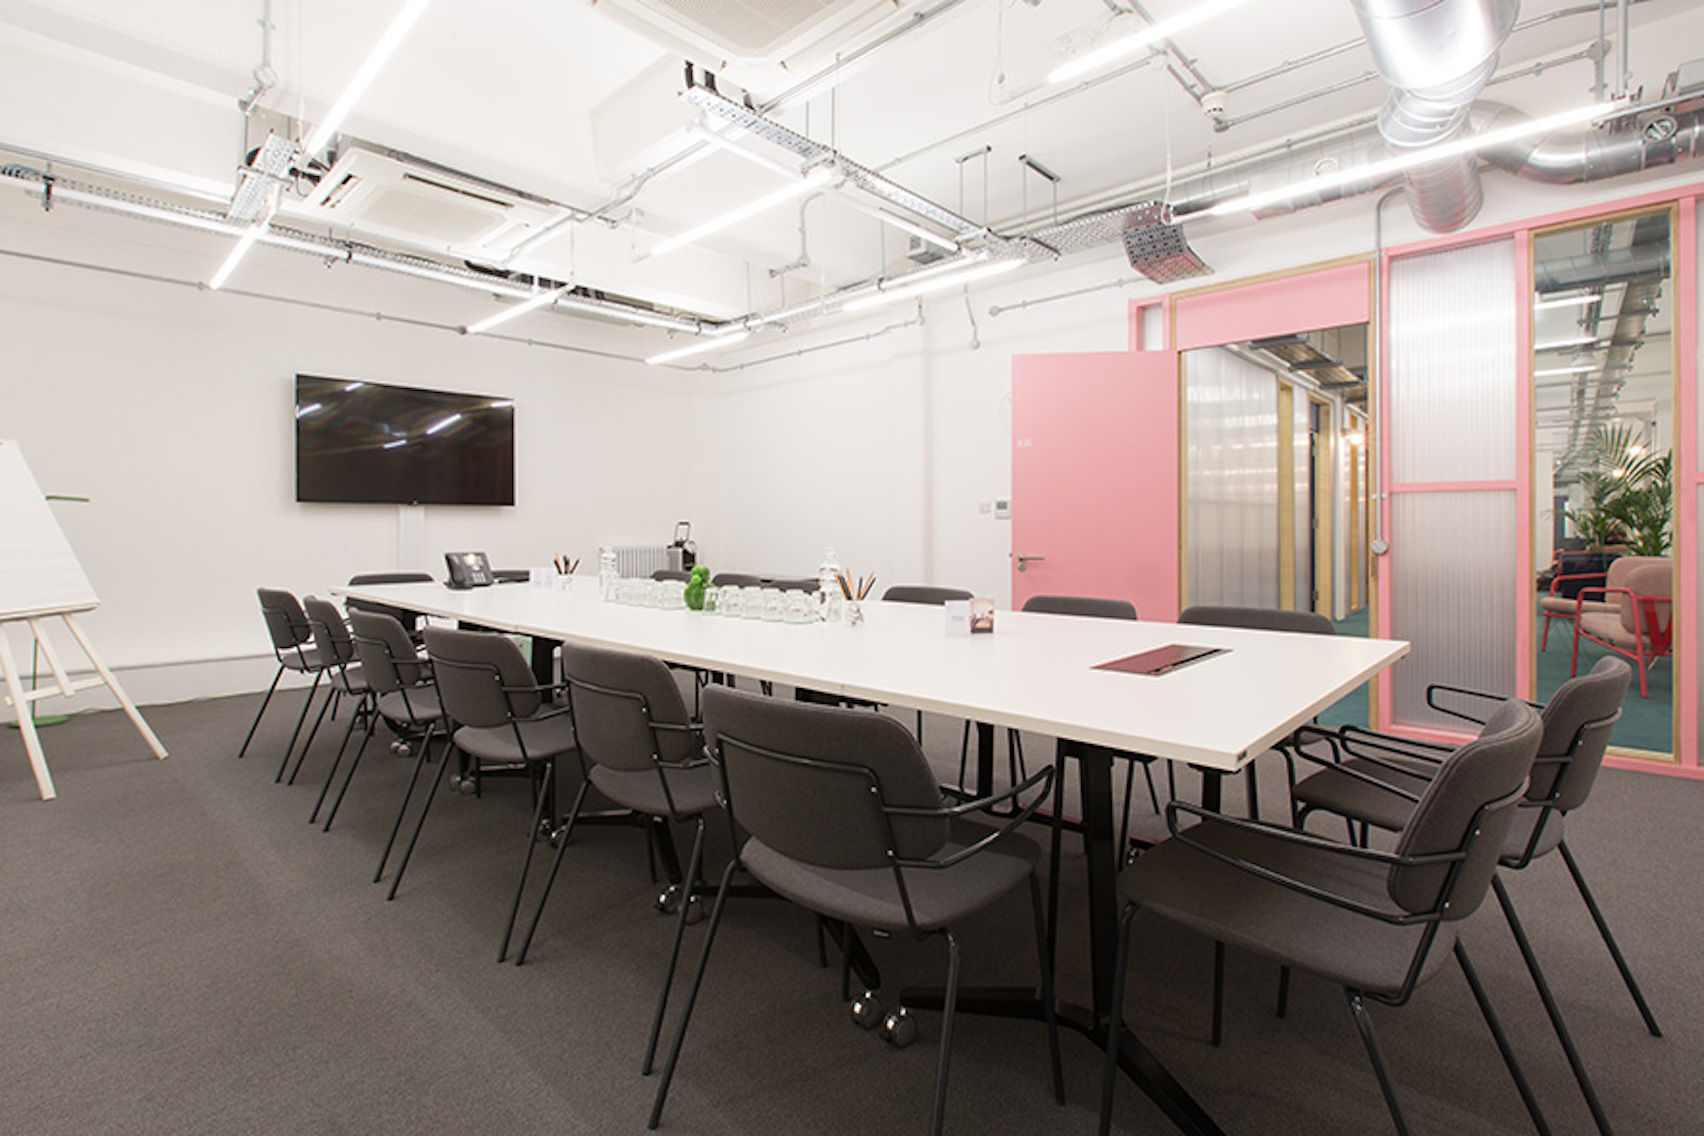 Meeting Room Hire Whitechapel